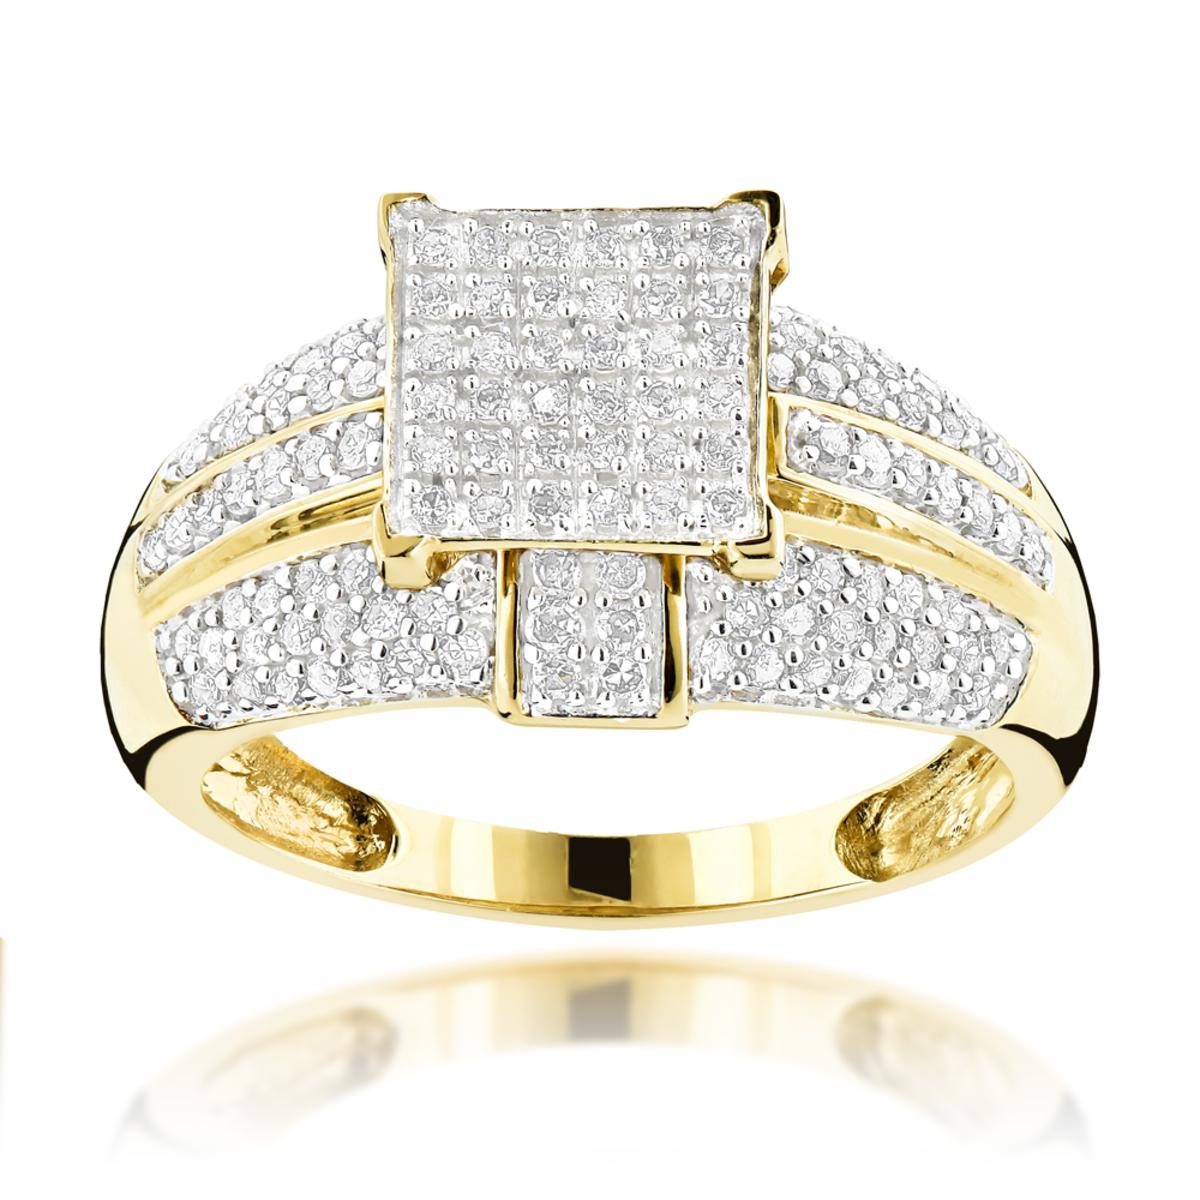 14K Gold Diamond Engagement Ring 0.93ct